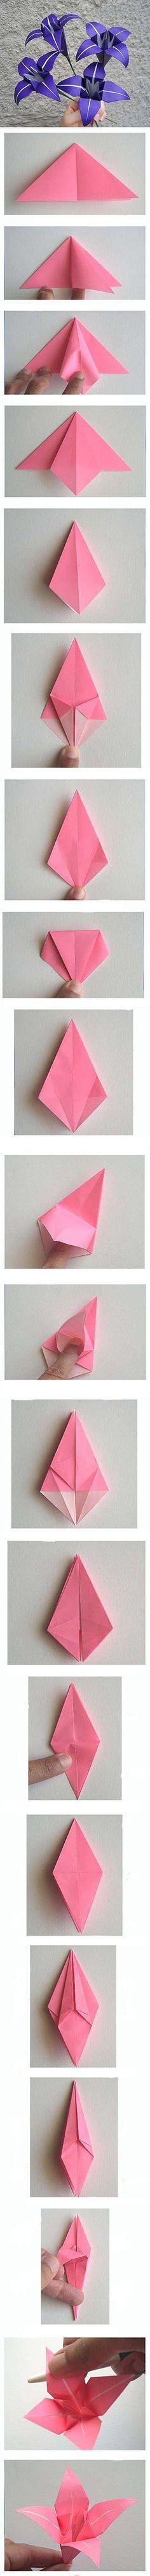 Easy Dollar Bill Origami Heart Dollar Bill Origami Origami Hearts